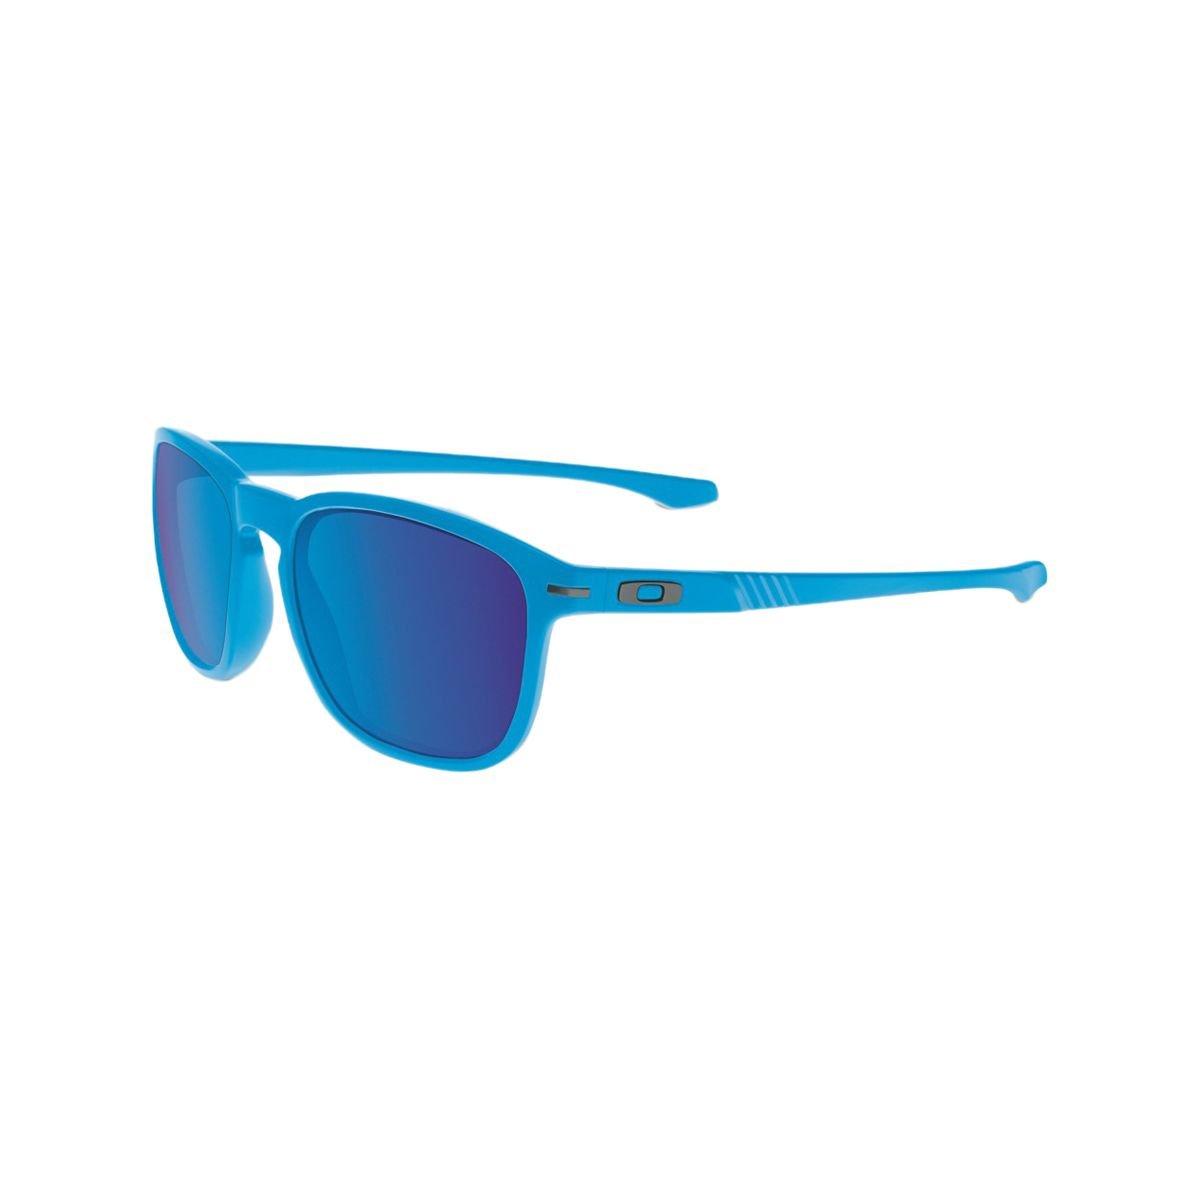 Oakley Sonnenbrille Enduro, Matte Sky W/Sapphire Iridium, One size, OO9223-19